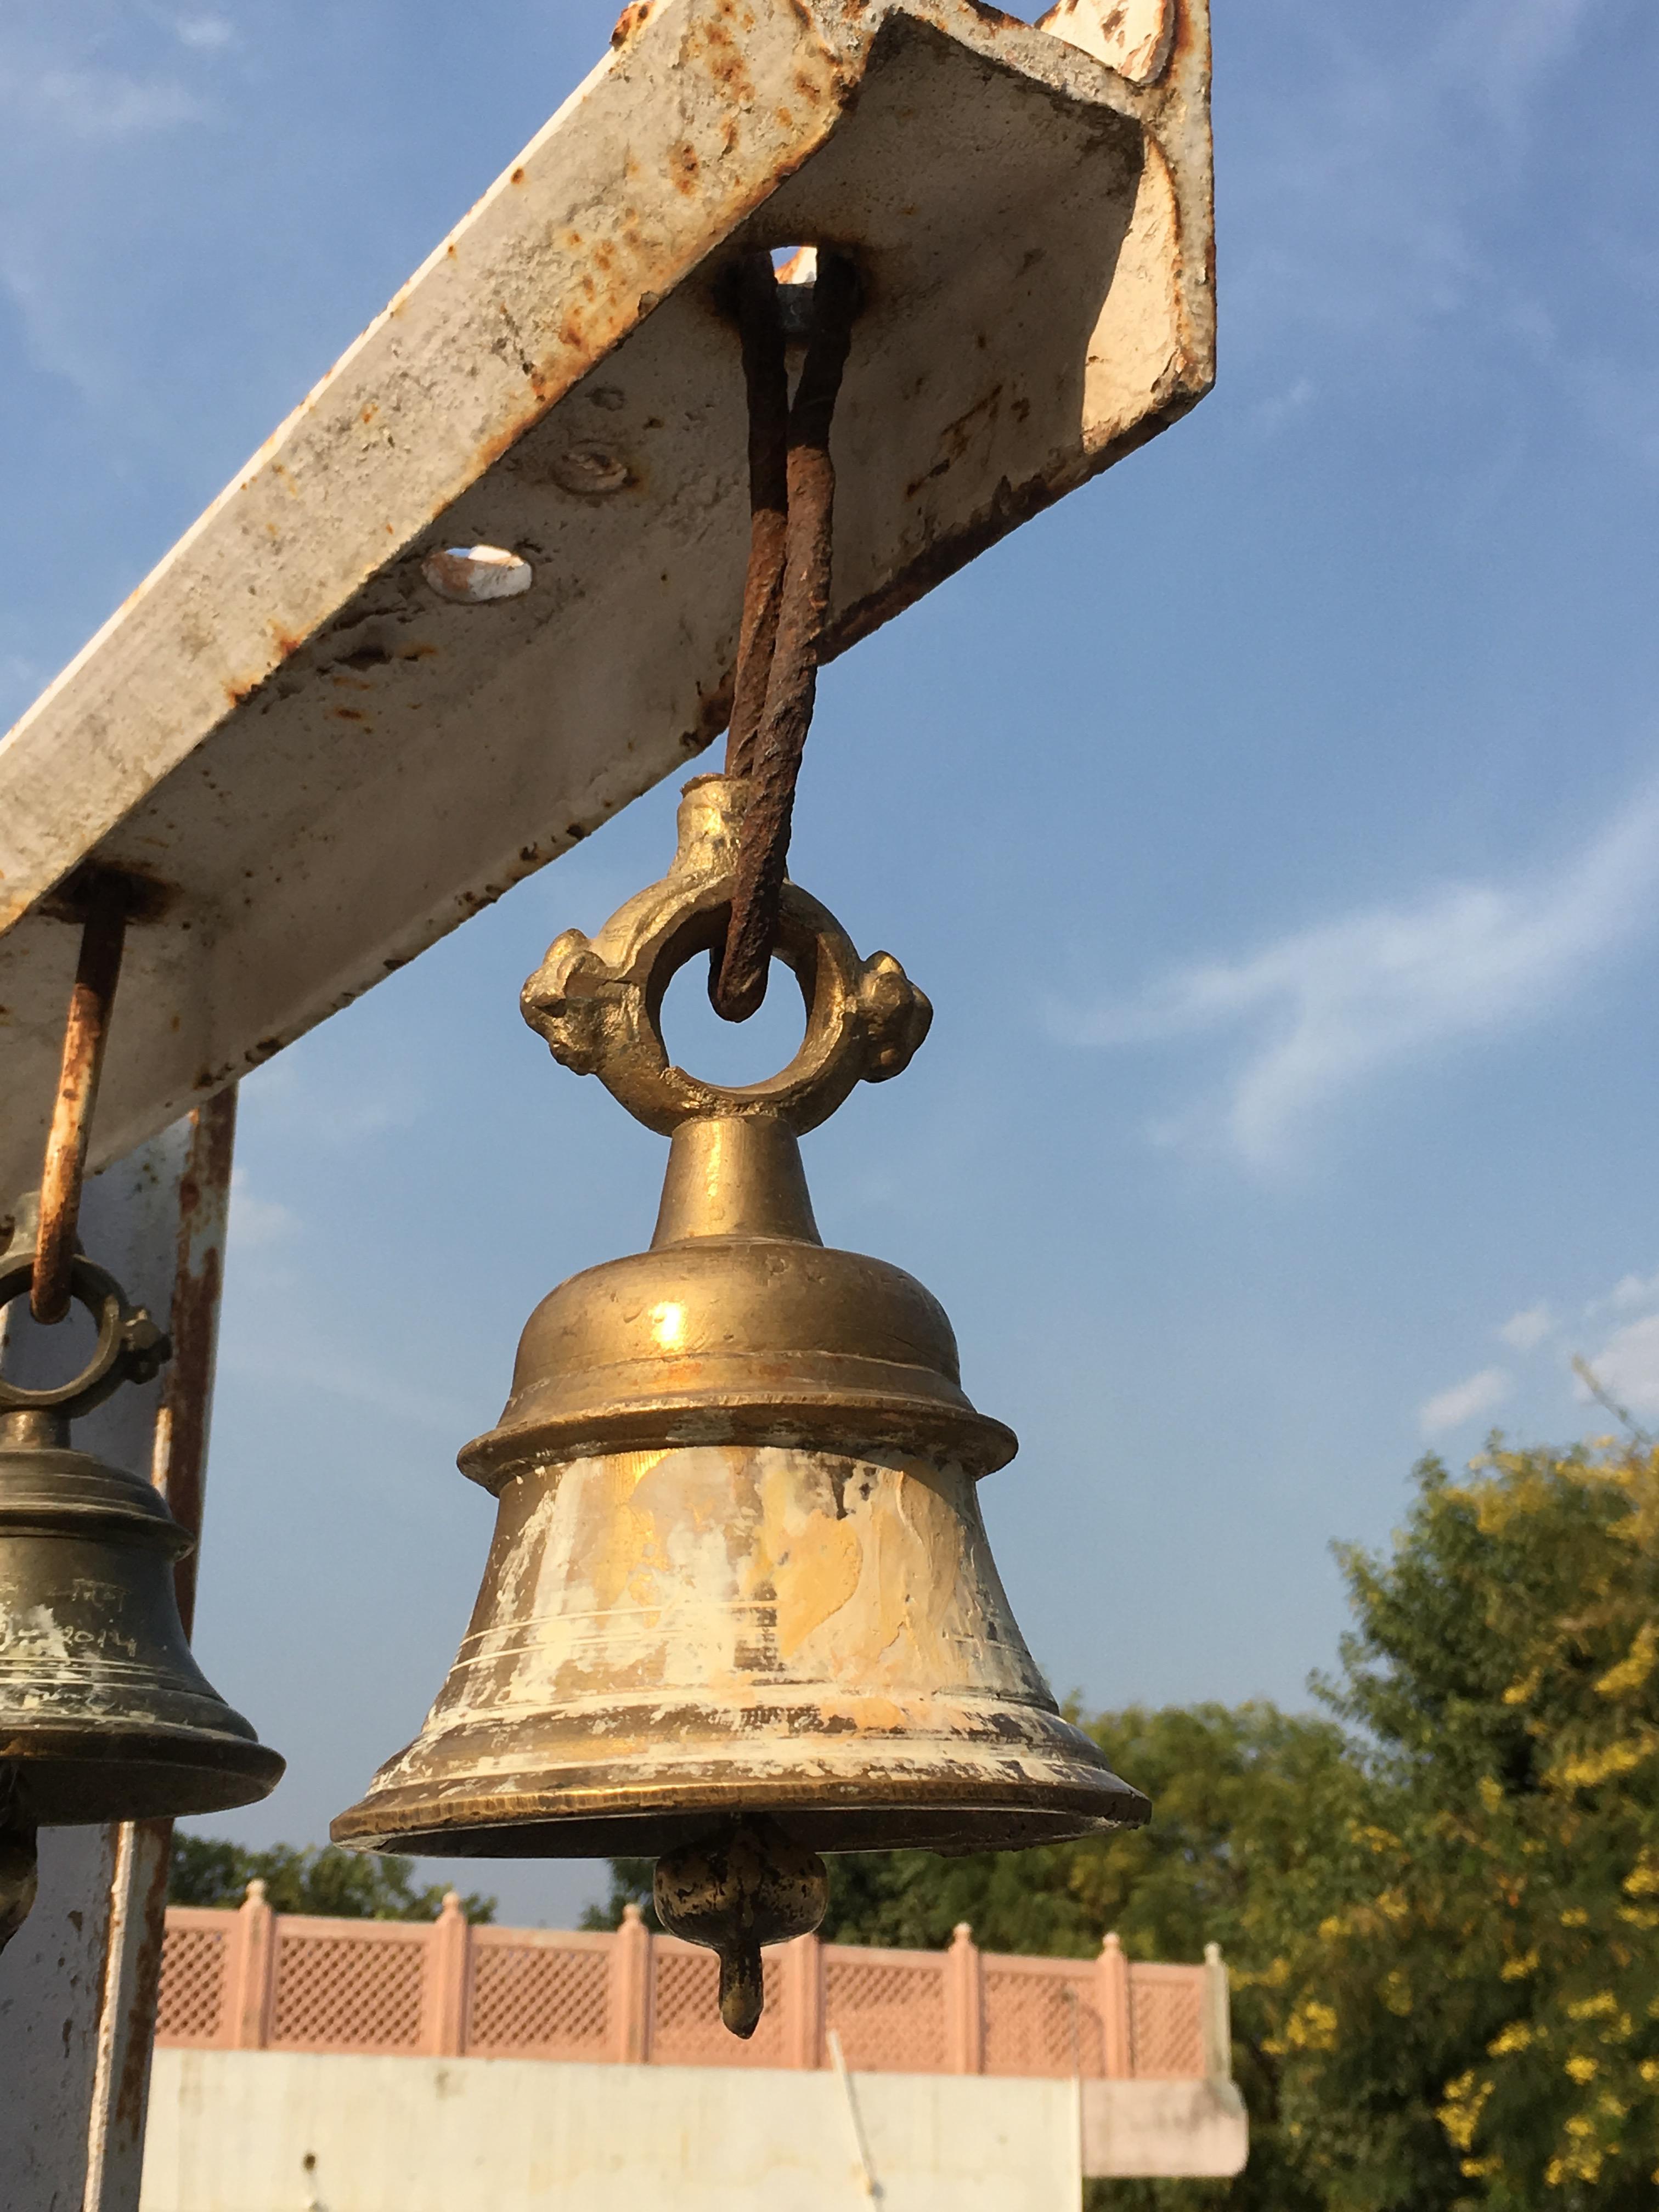 Temple bell, Jaipur